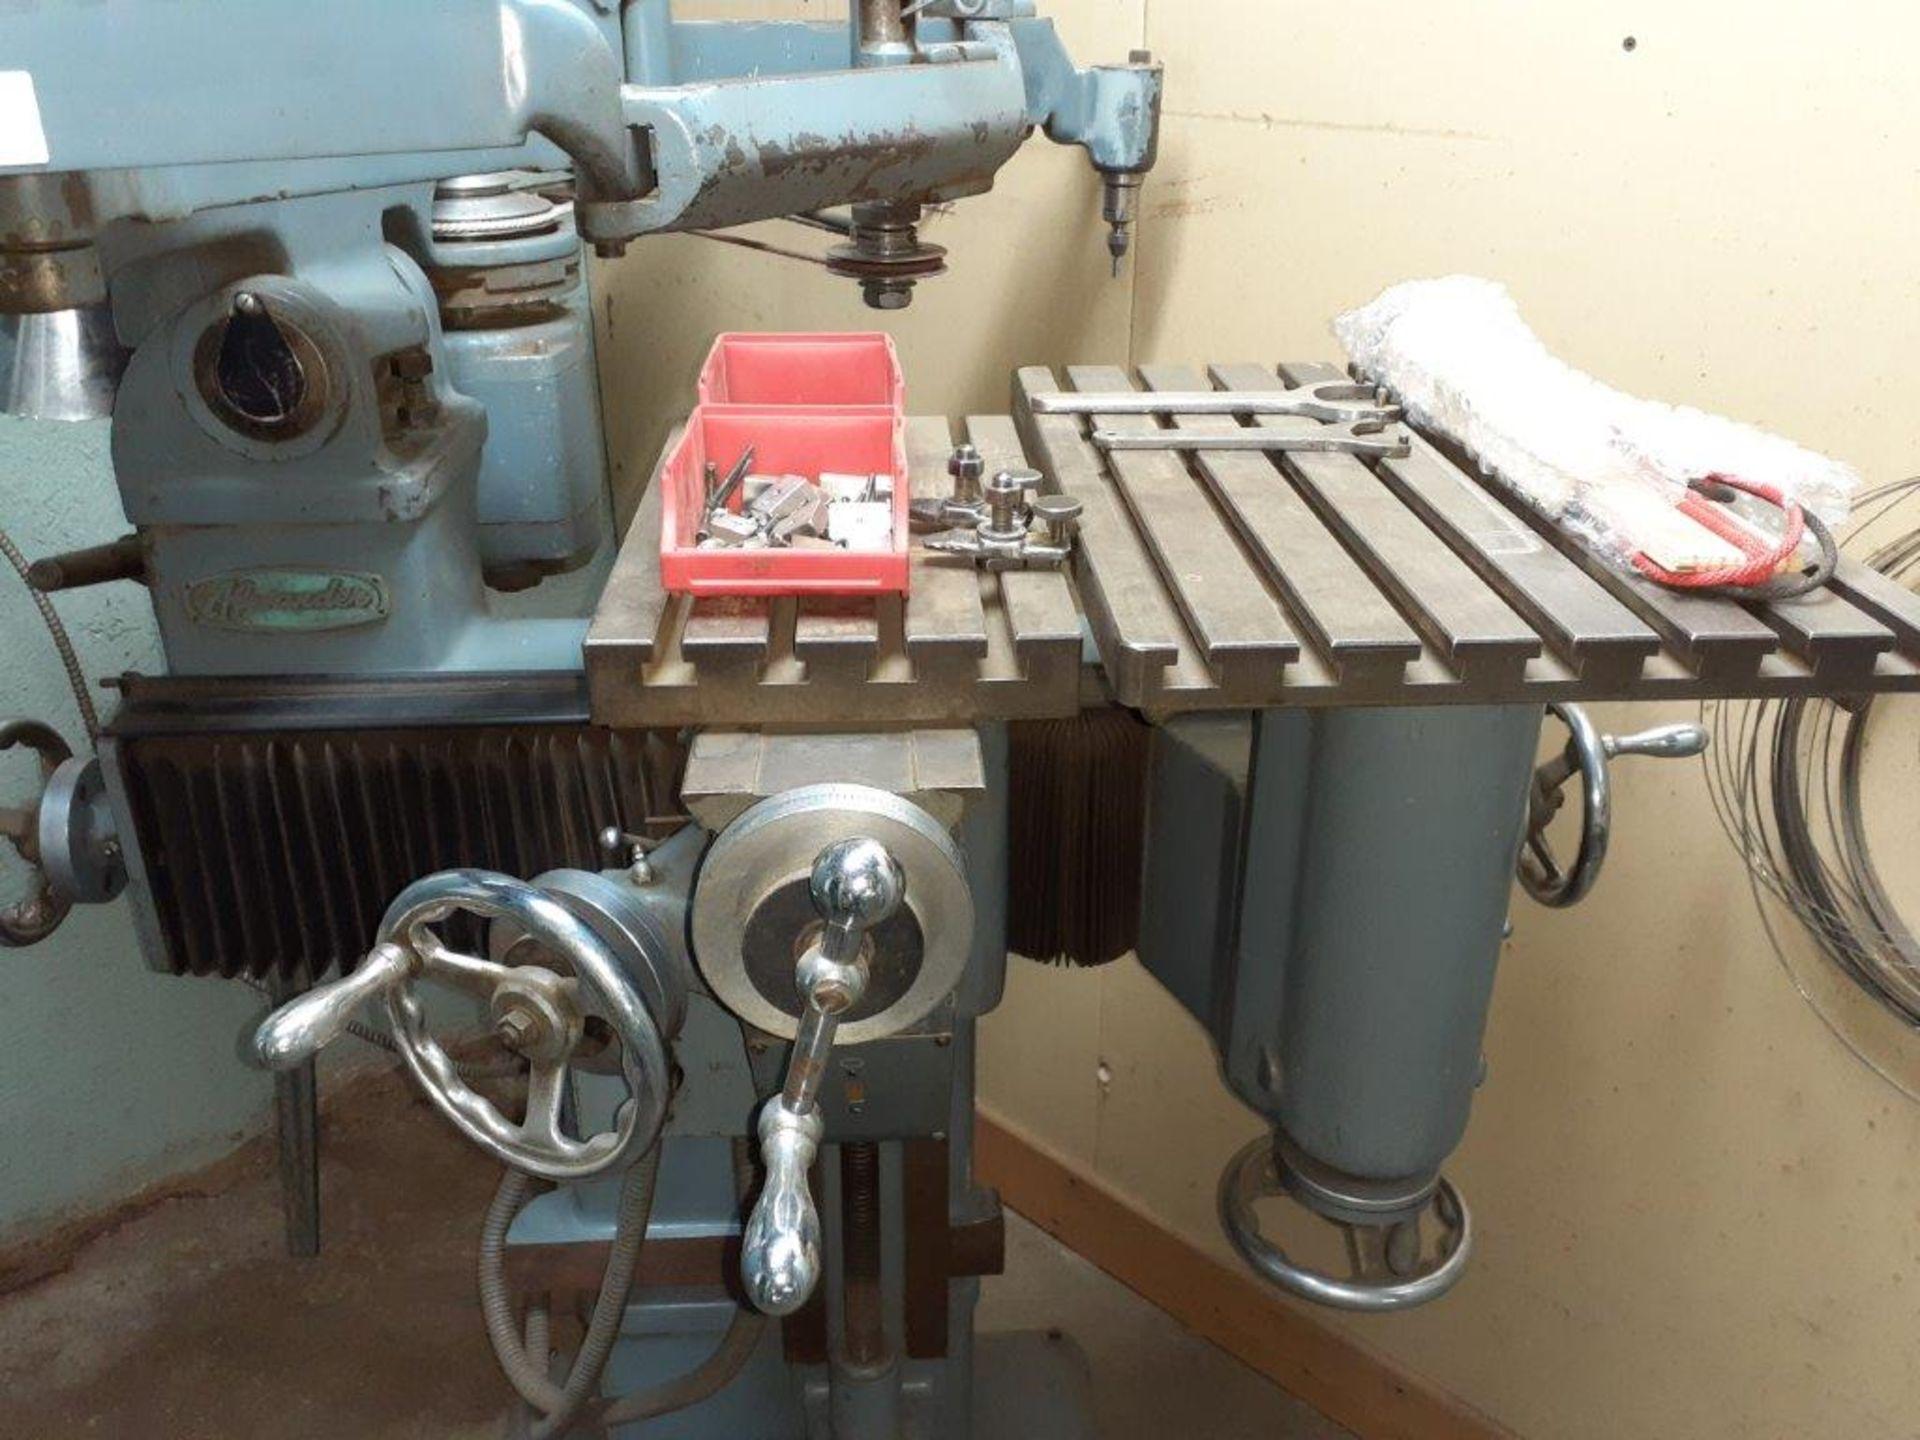 ALEXANDER PENTAGRAPH Machine, mod: 3A, c/w Metal Cabinet & Assorted Parts - Image 4 of 8